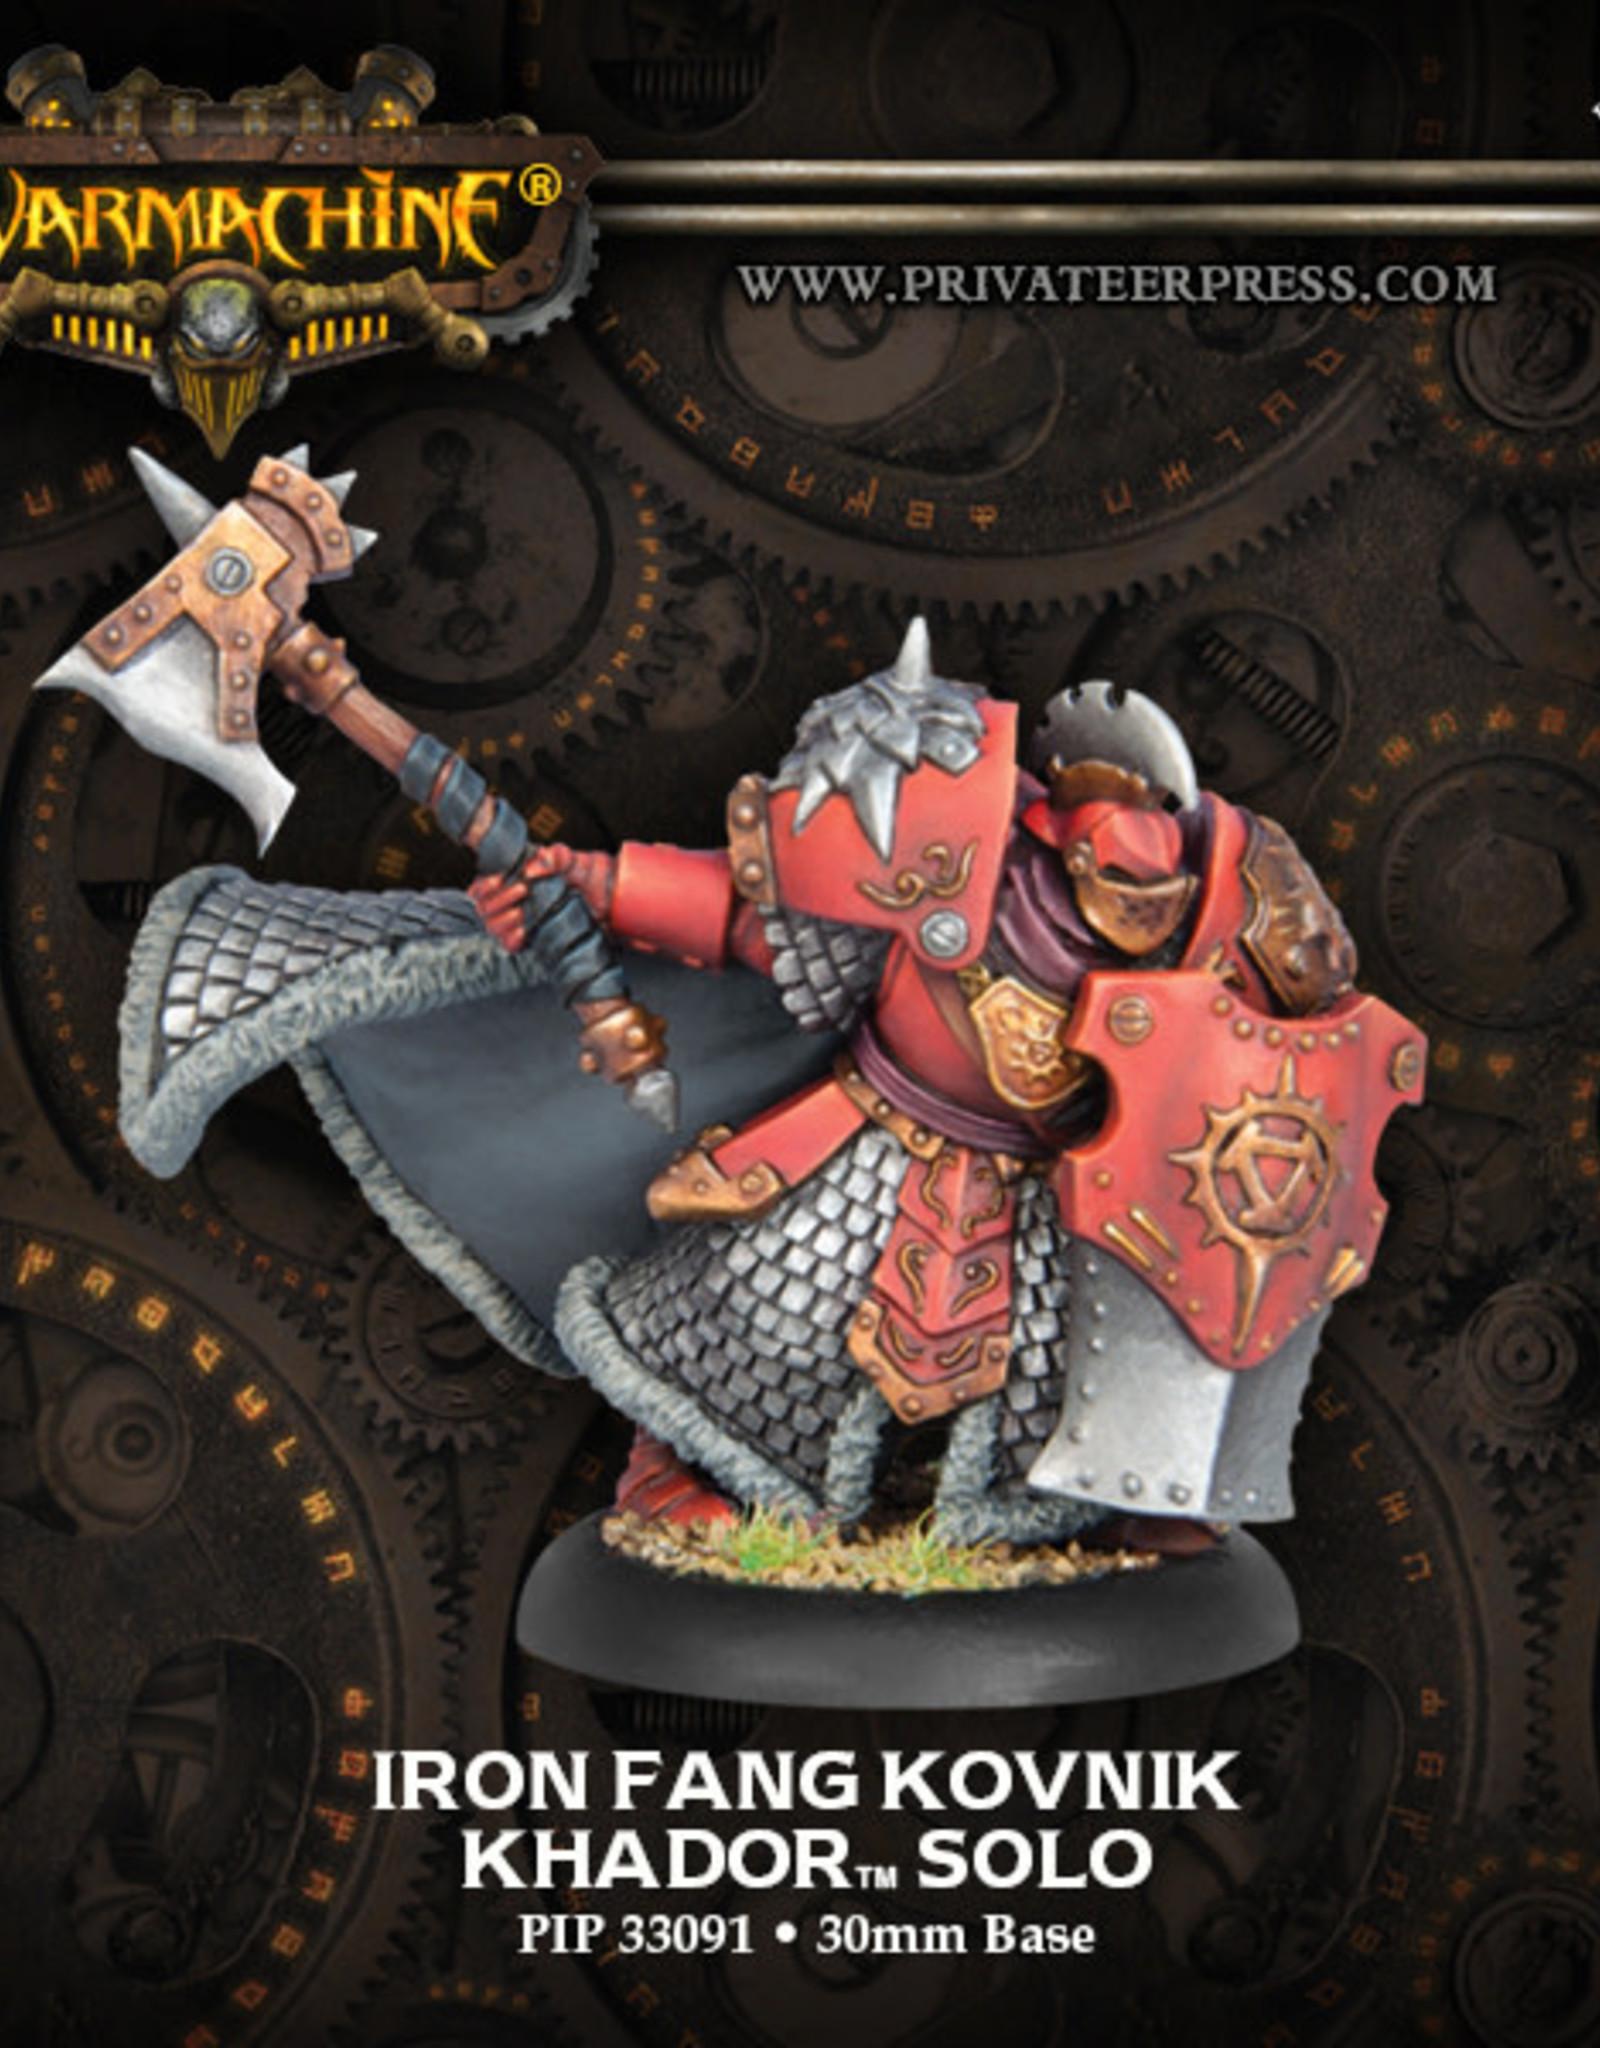 Warmachine Khador - Iron Fang Kovnik